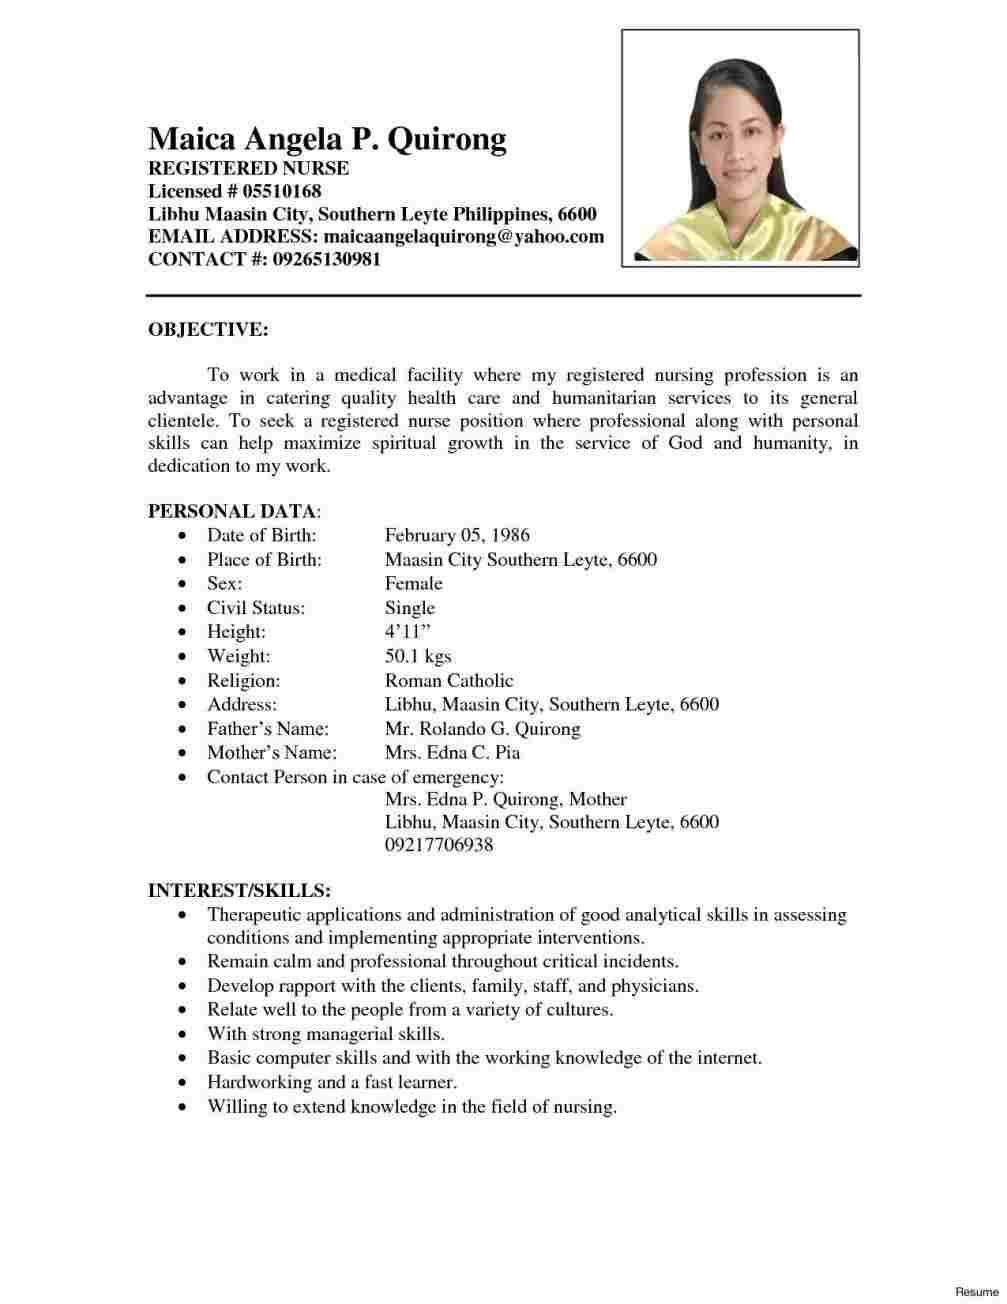 Sample Of Nurse Resume In Philippines